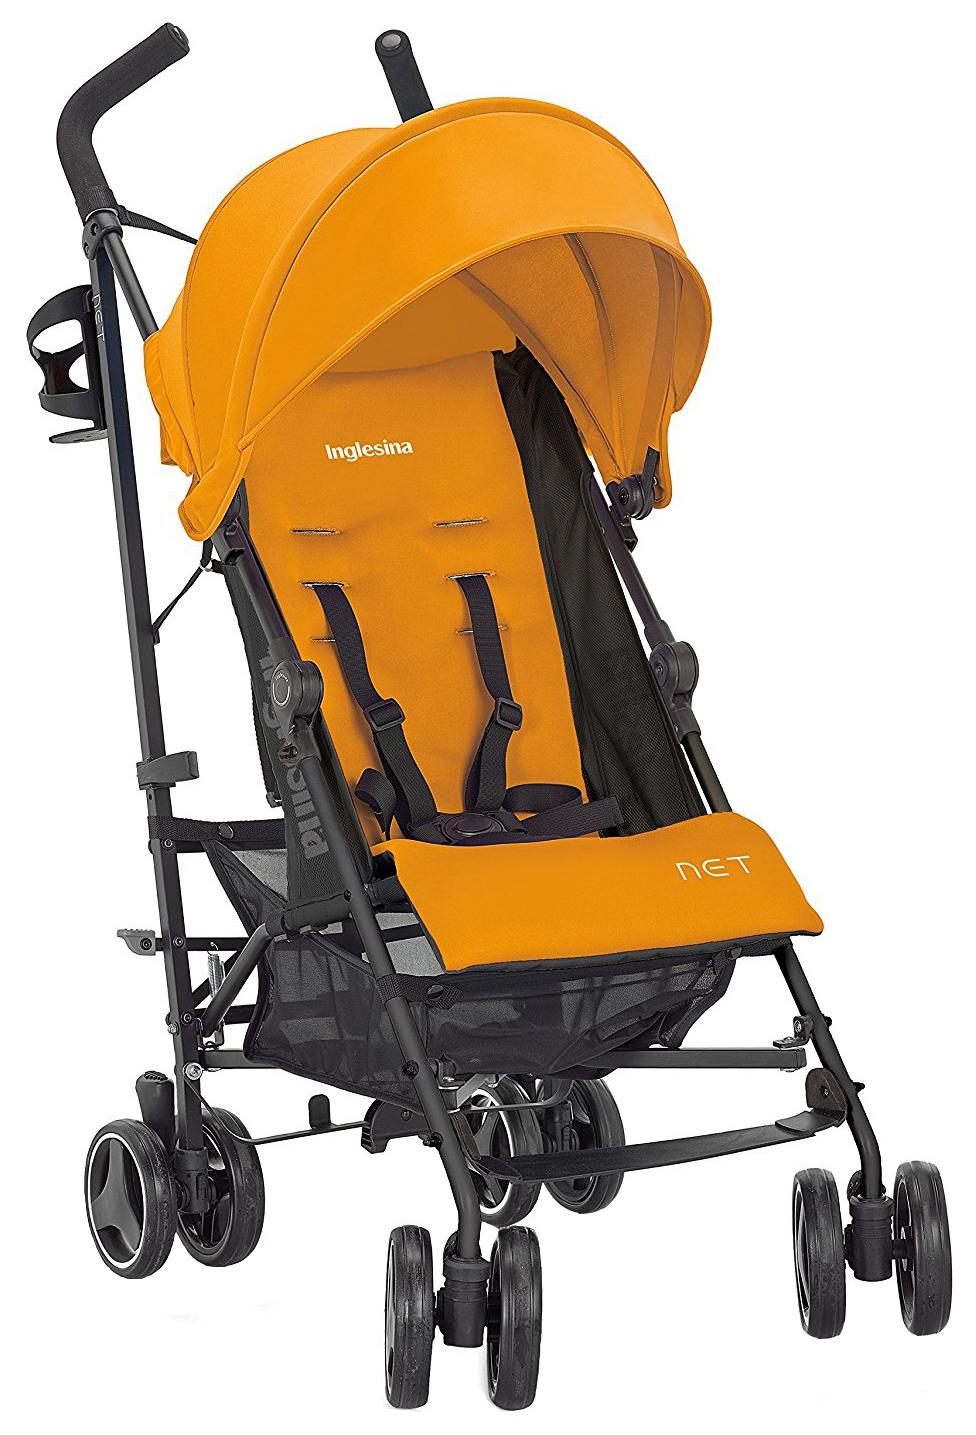 Прогулочная коляска Inglesina Net Zenzero Super Light Stroller